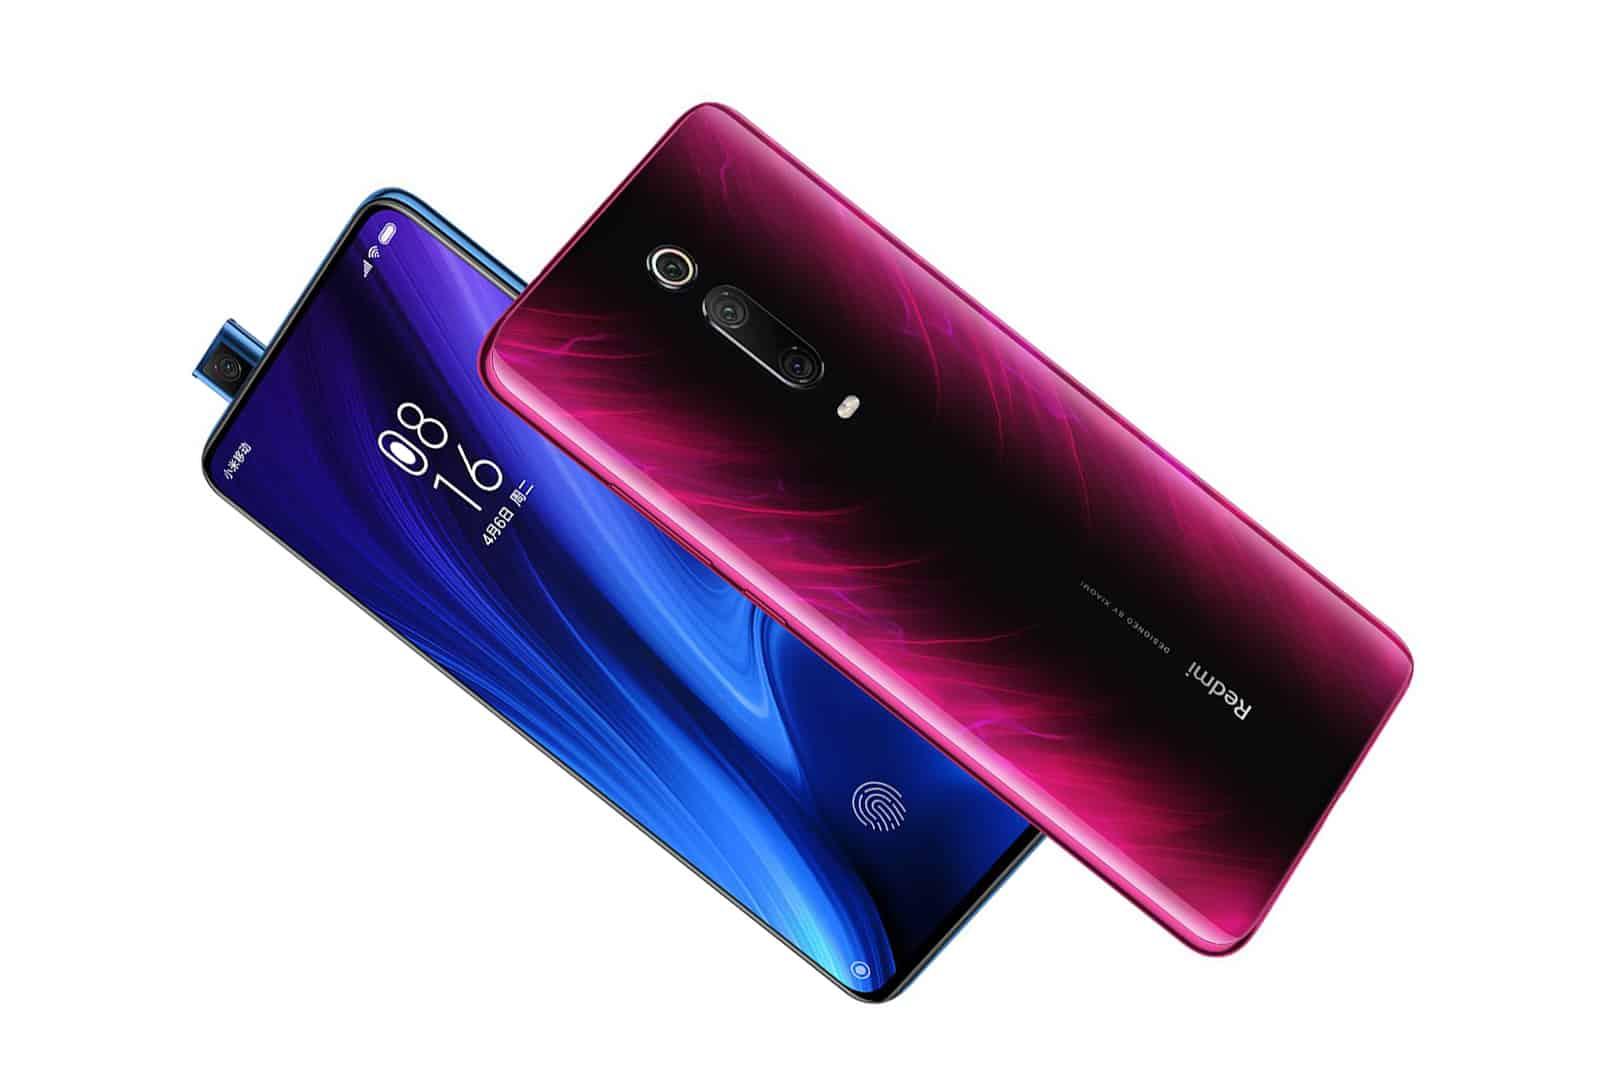 Xiaomi Redmi K20 Pro appears